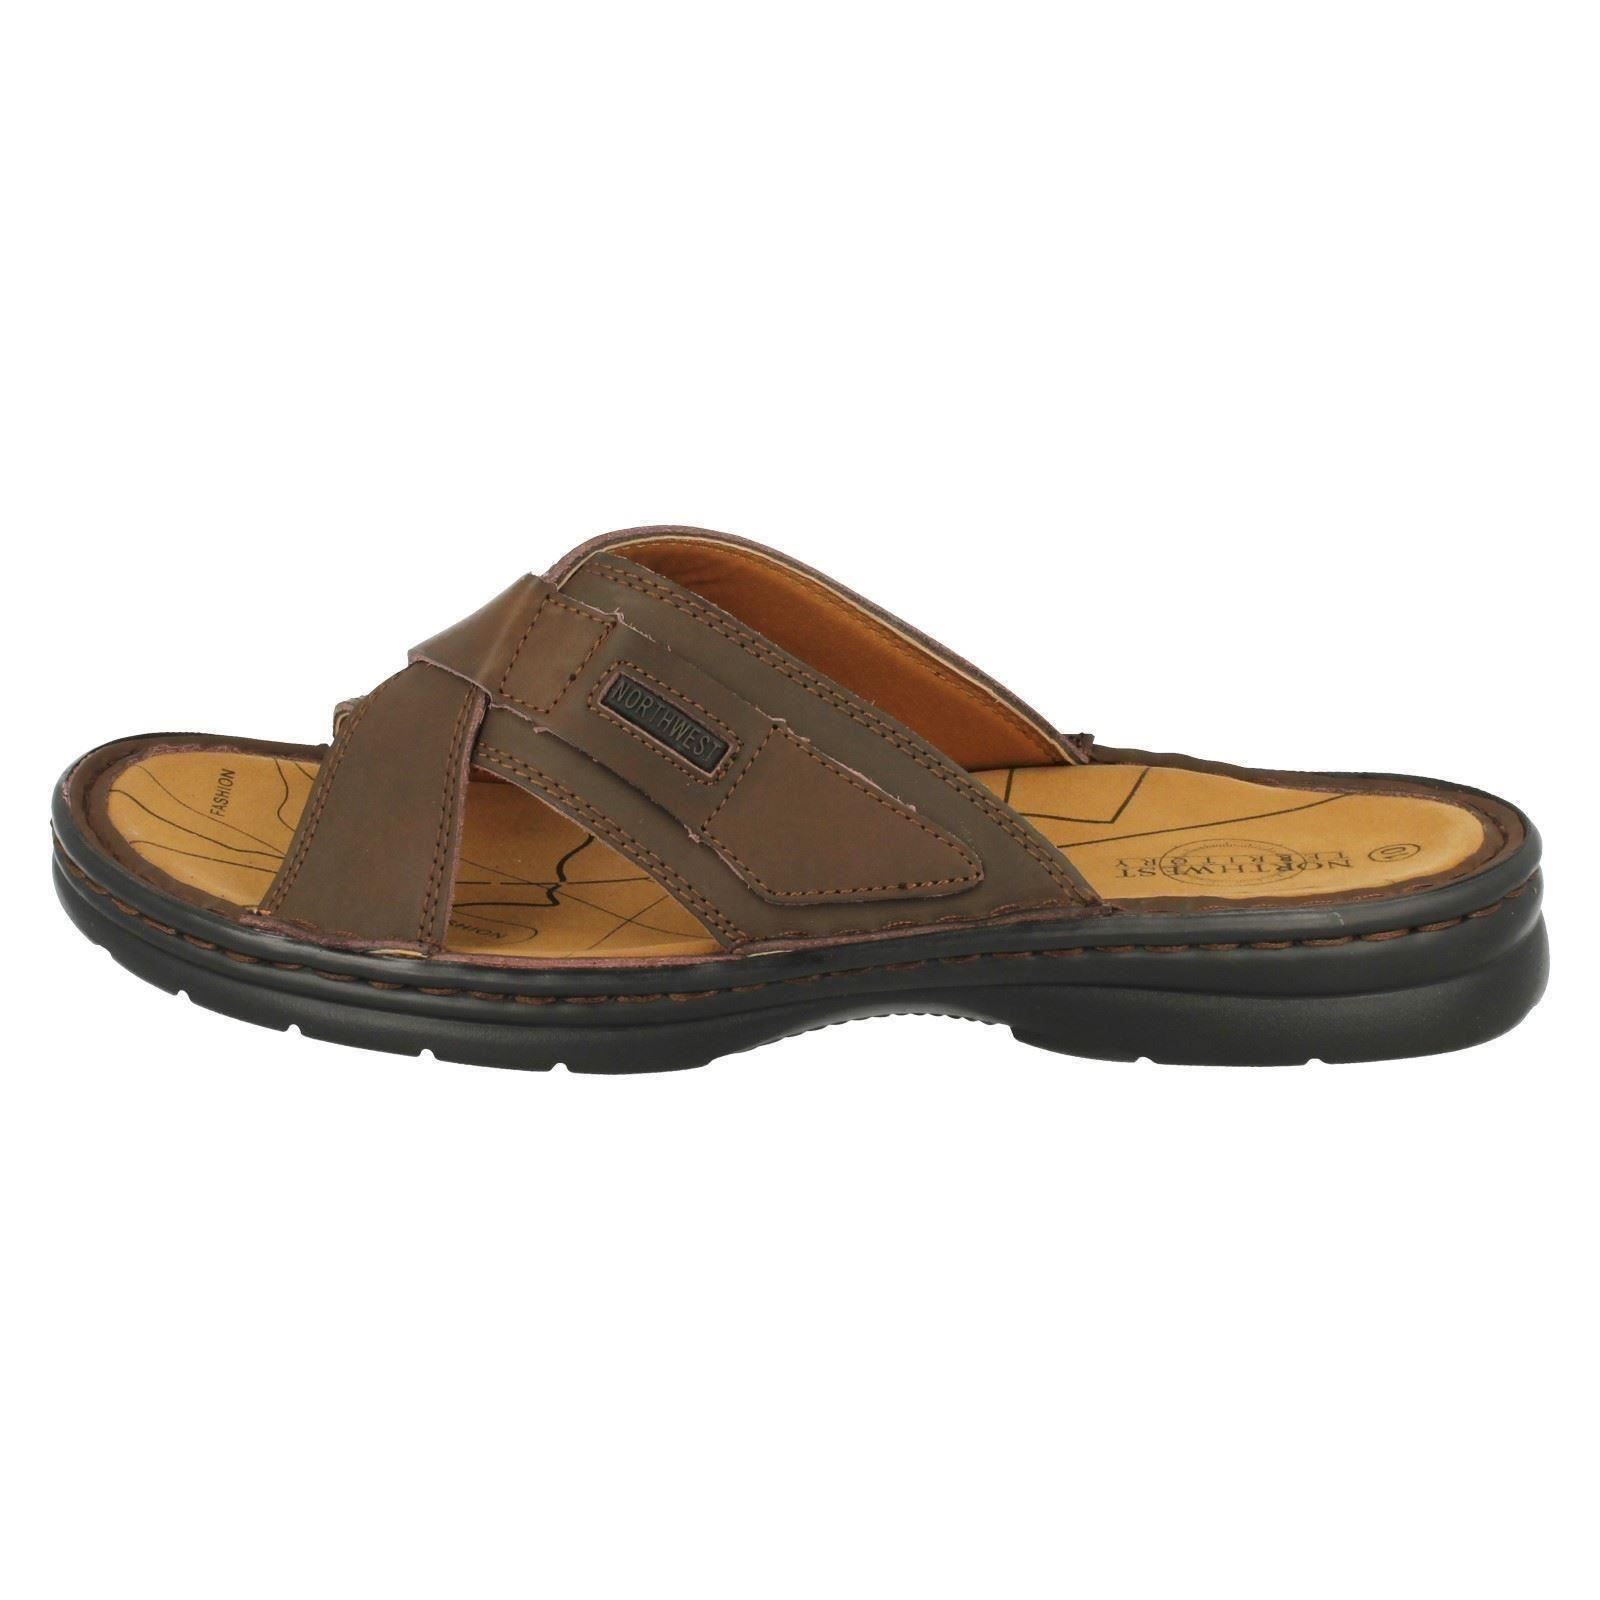 Ebay Northwest Shoes Men S